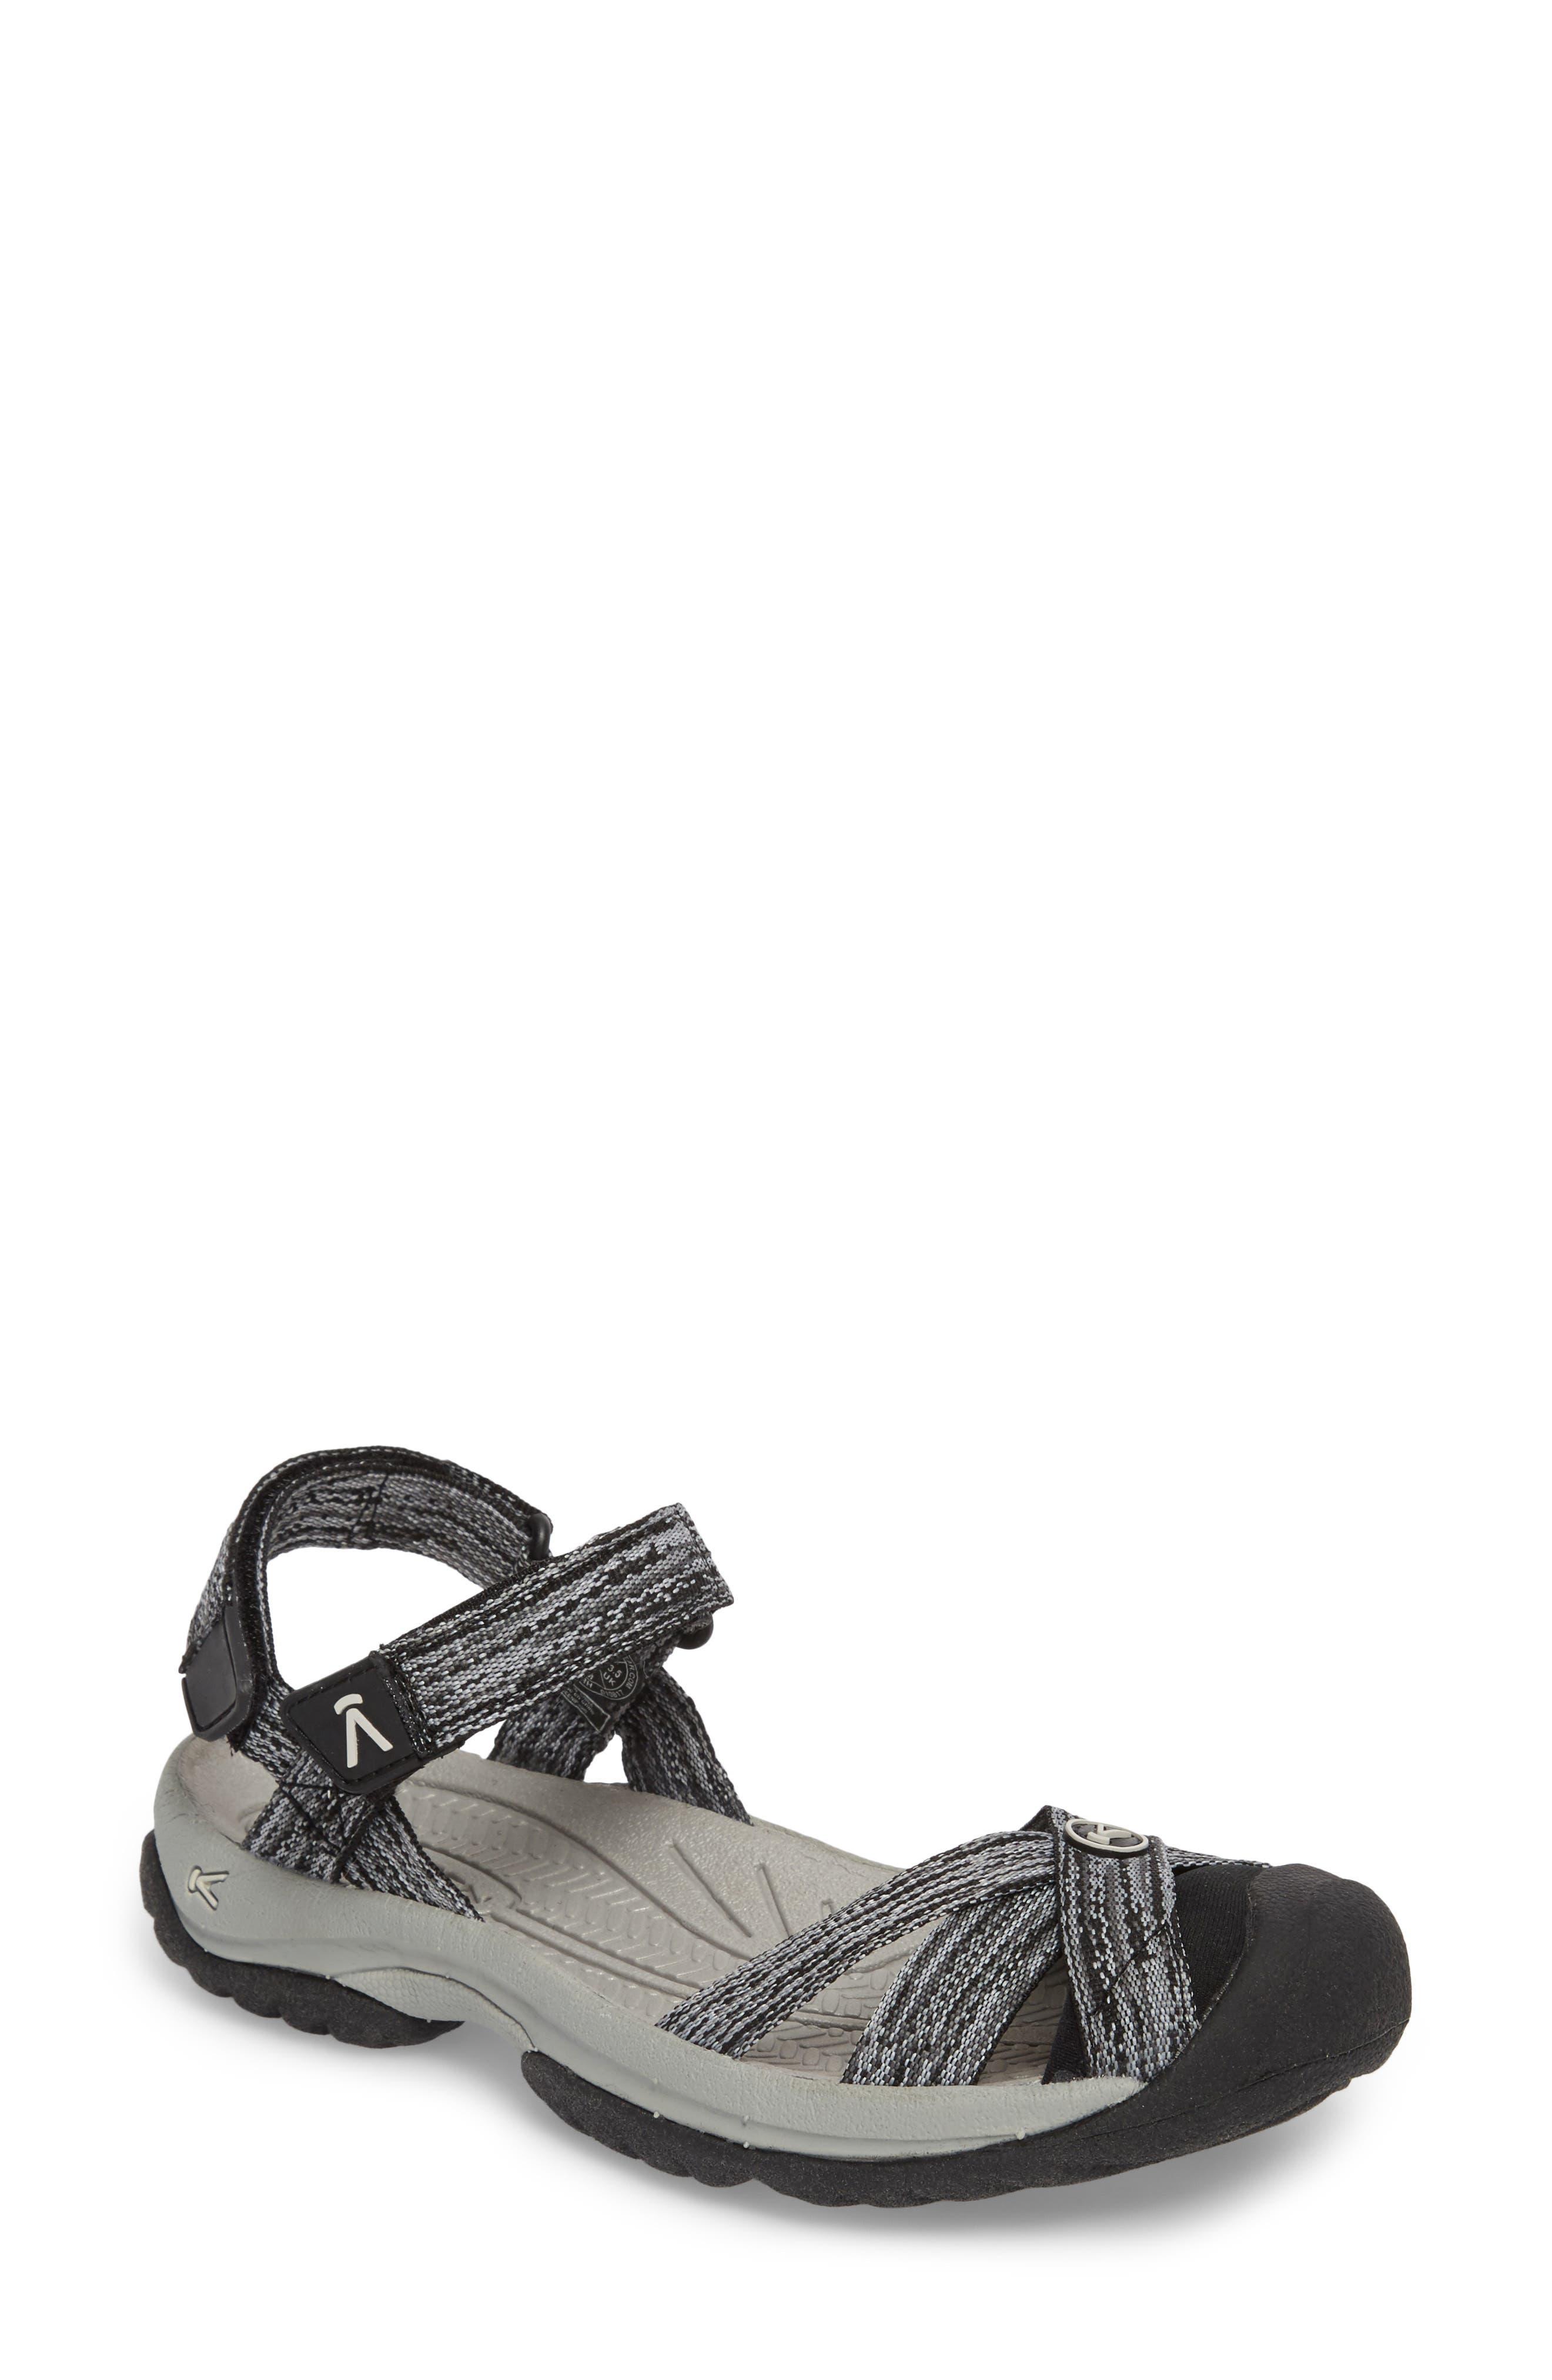 Bali Sandal,                         Main,                         color, NEUTRAL GRAY/ BLACK